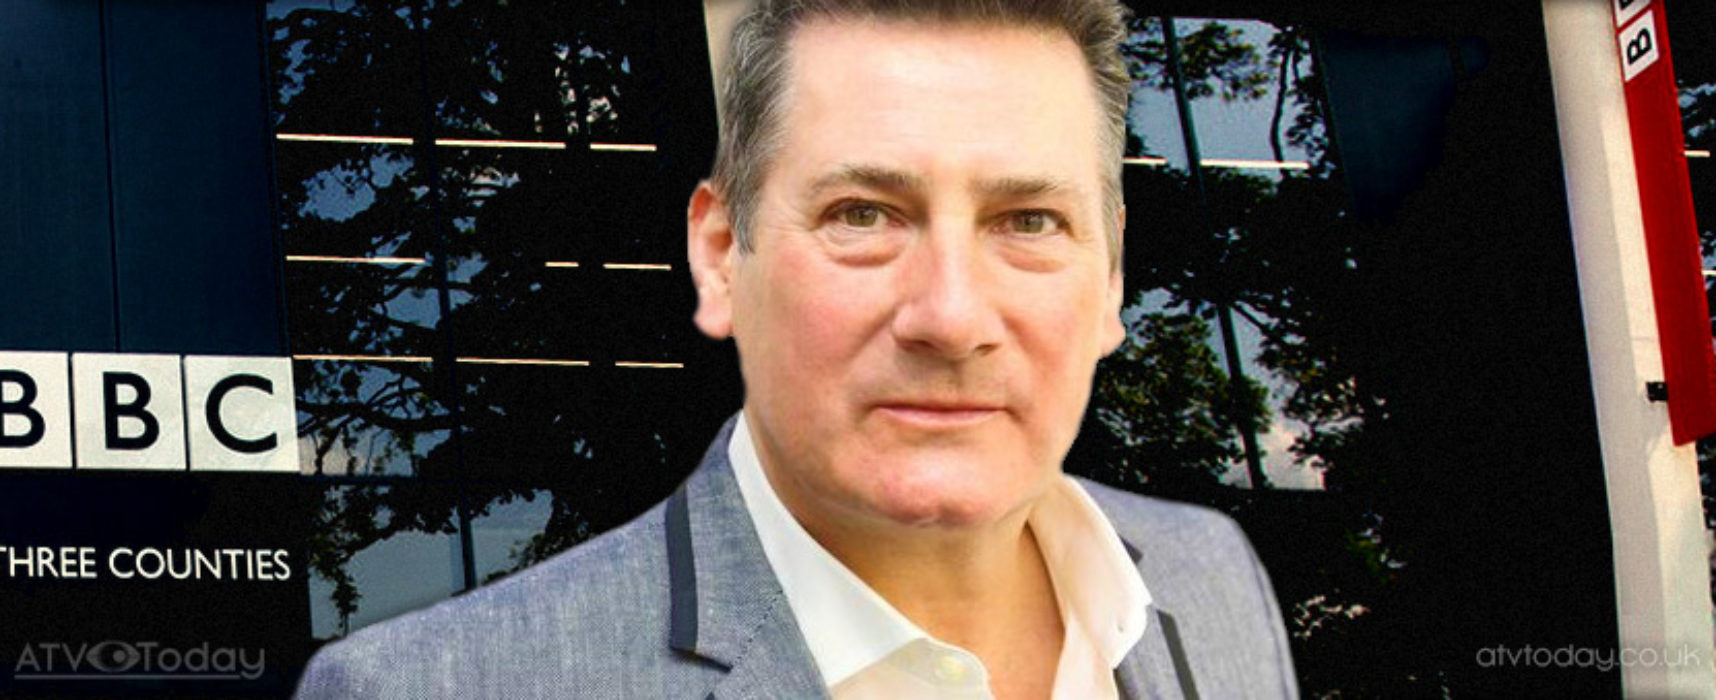 Spandau Ballet's Tony Hadley joins Three Counties Radio